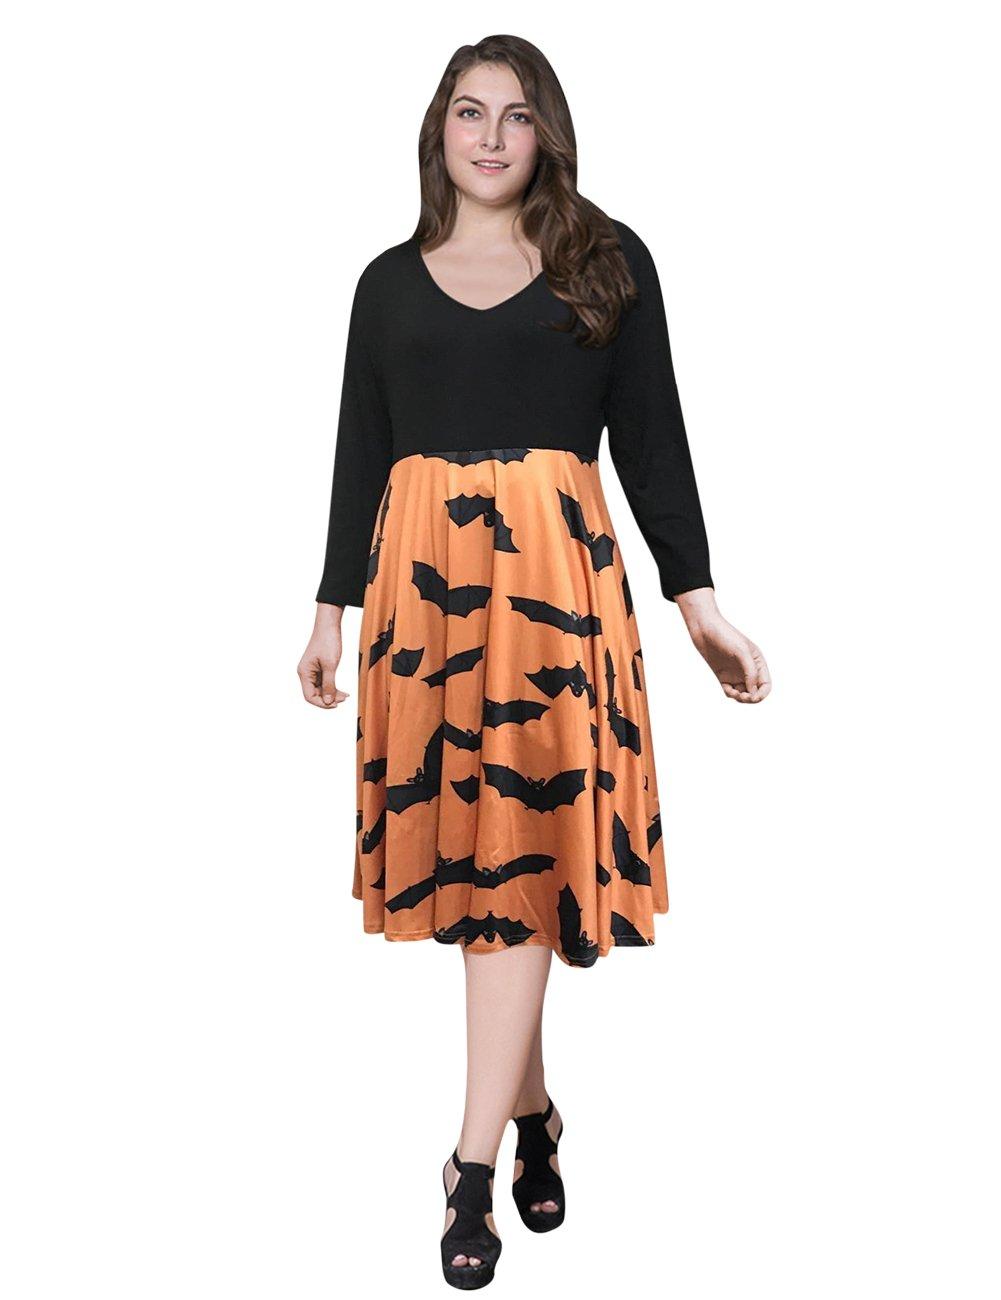 AMZ PLUS Women Plus Size 3/4 Sleeve Swing Party Casual Dresses Orange 4XL